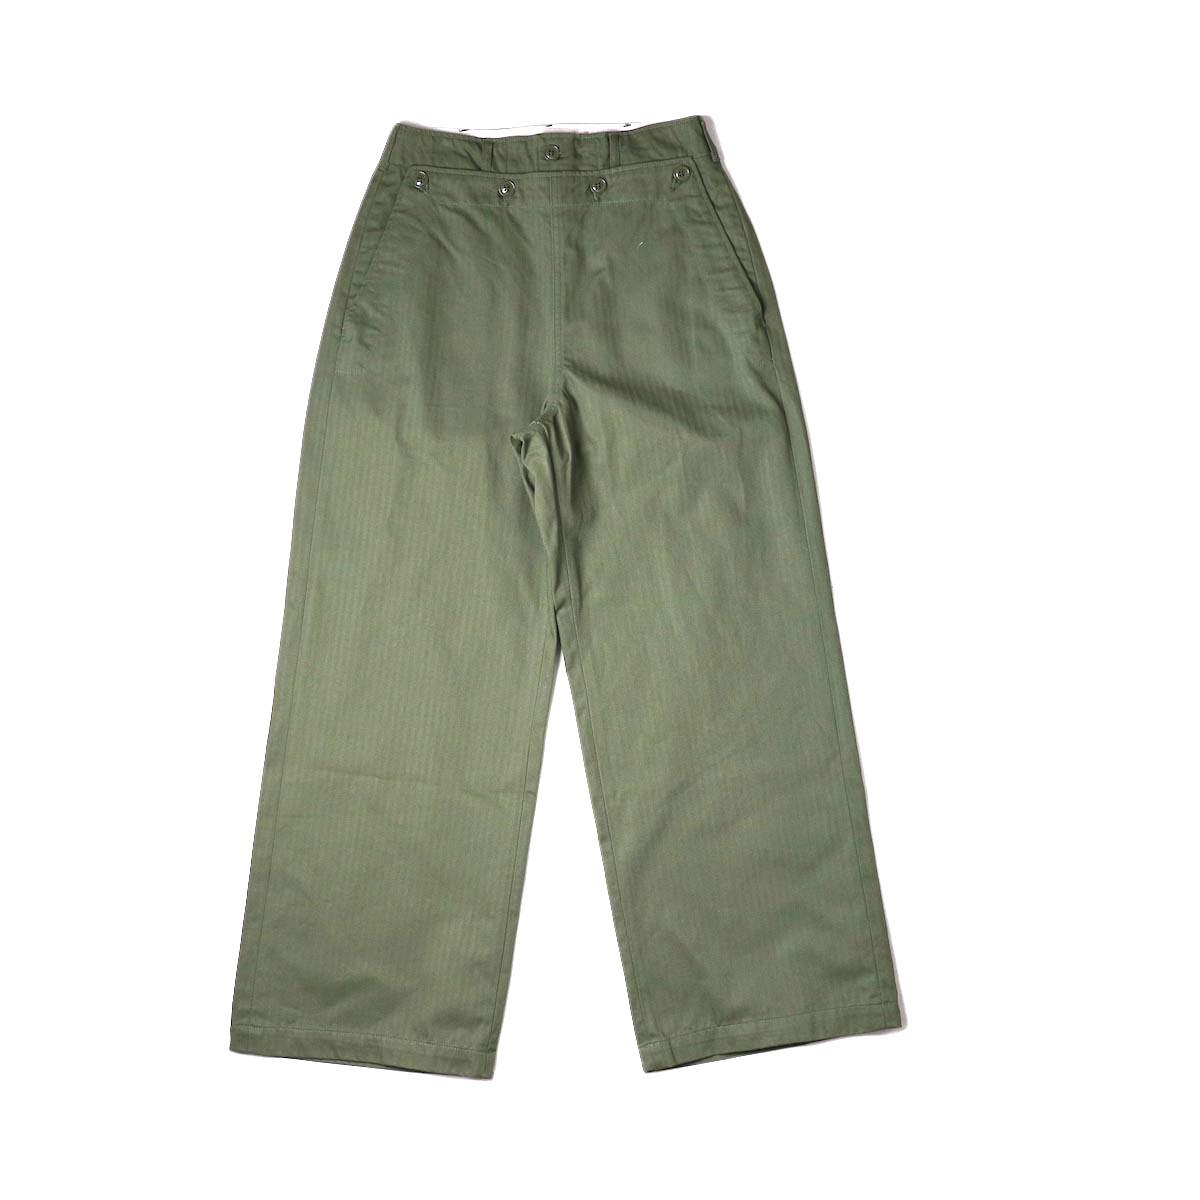 ENGINEERED GARMENTS / Sailor Pant (olive)